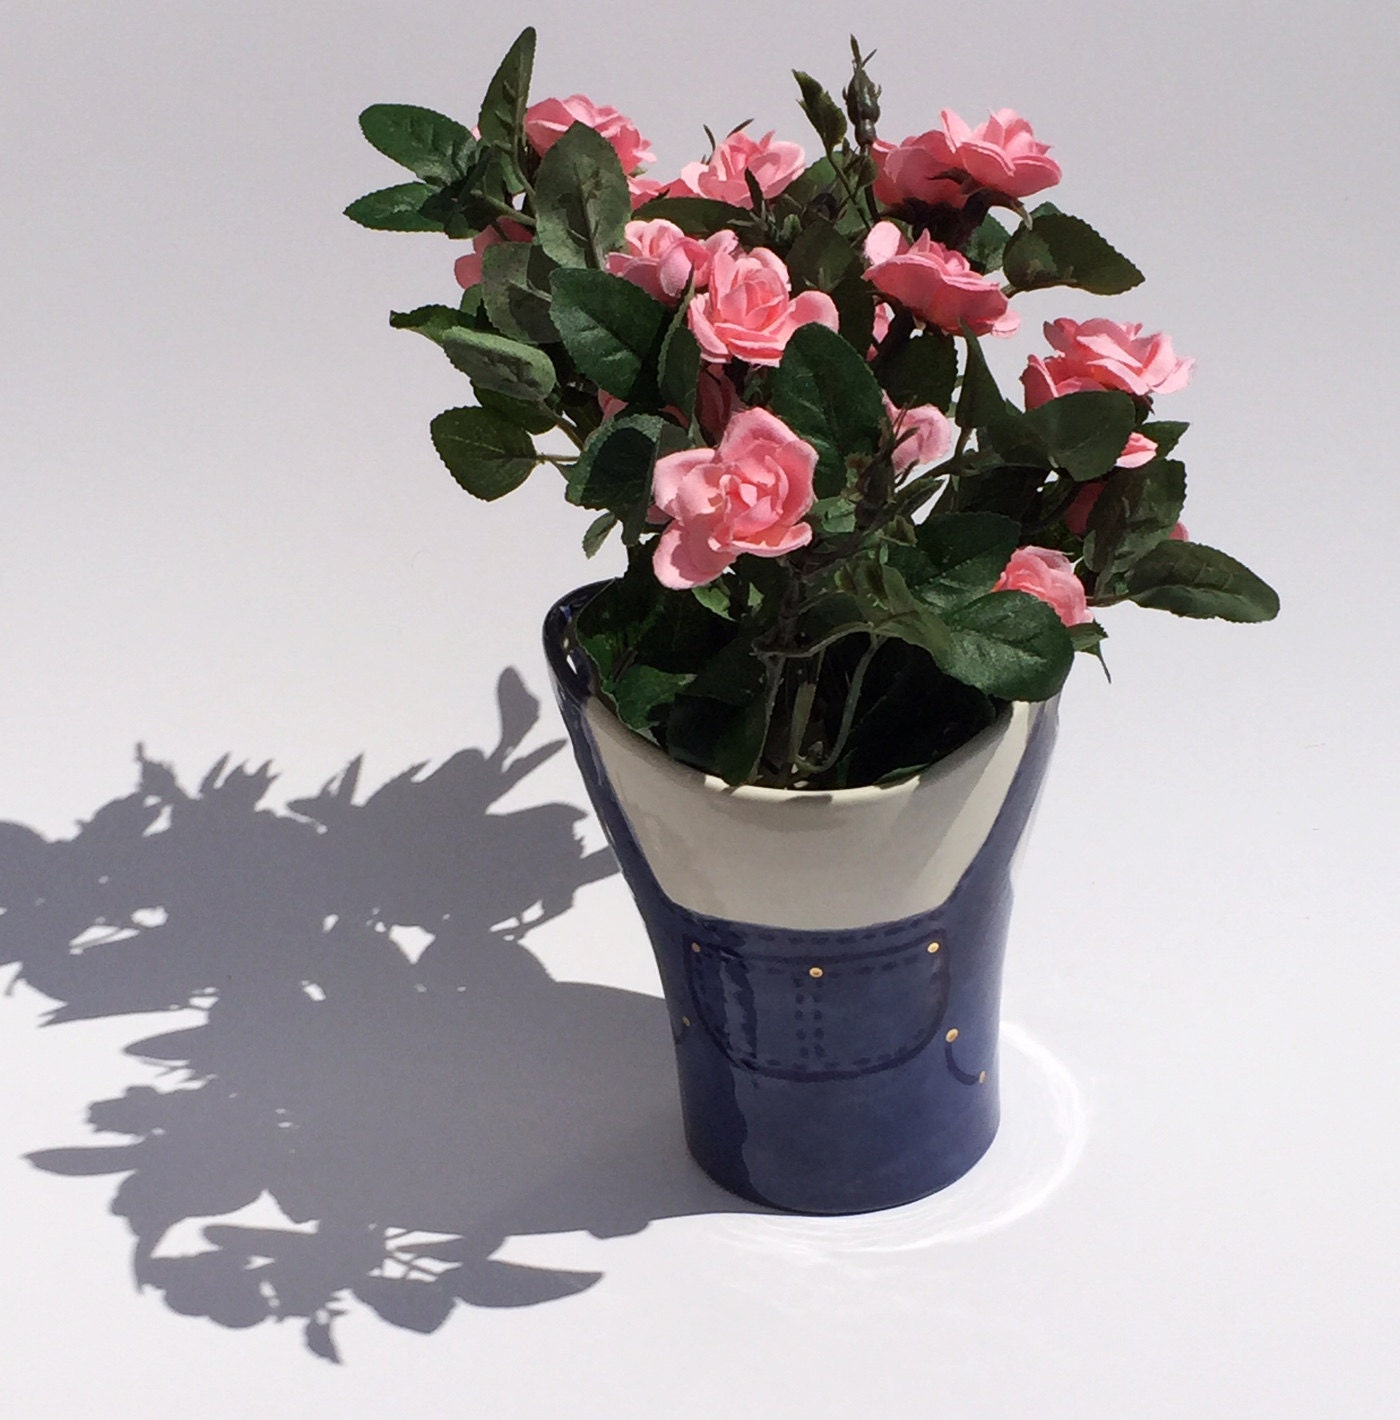 flower pot garden pot garden planter indoor pots ceramic. Black Bedroom Furniture Sets. Home Design Ideas